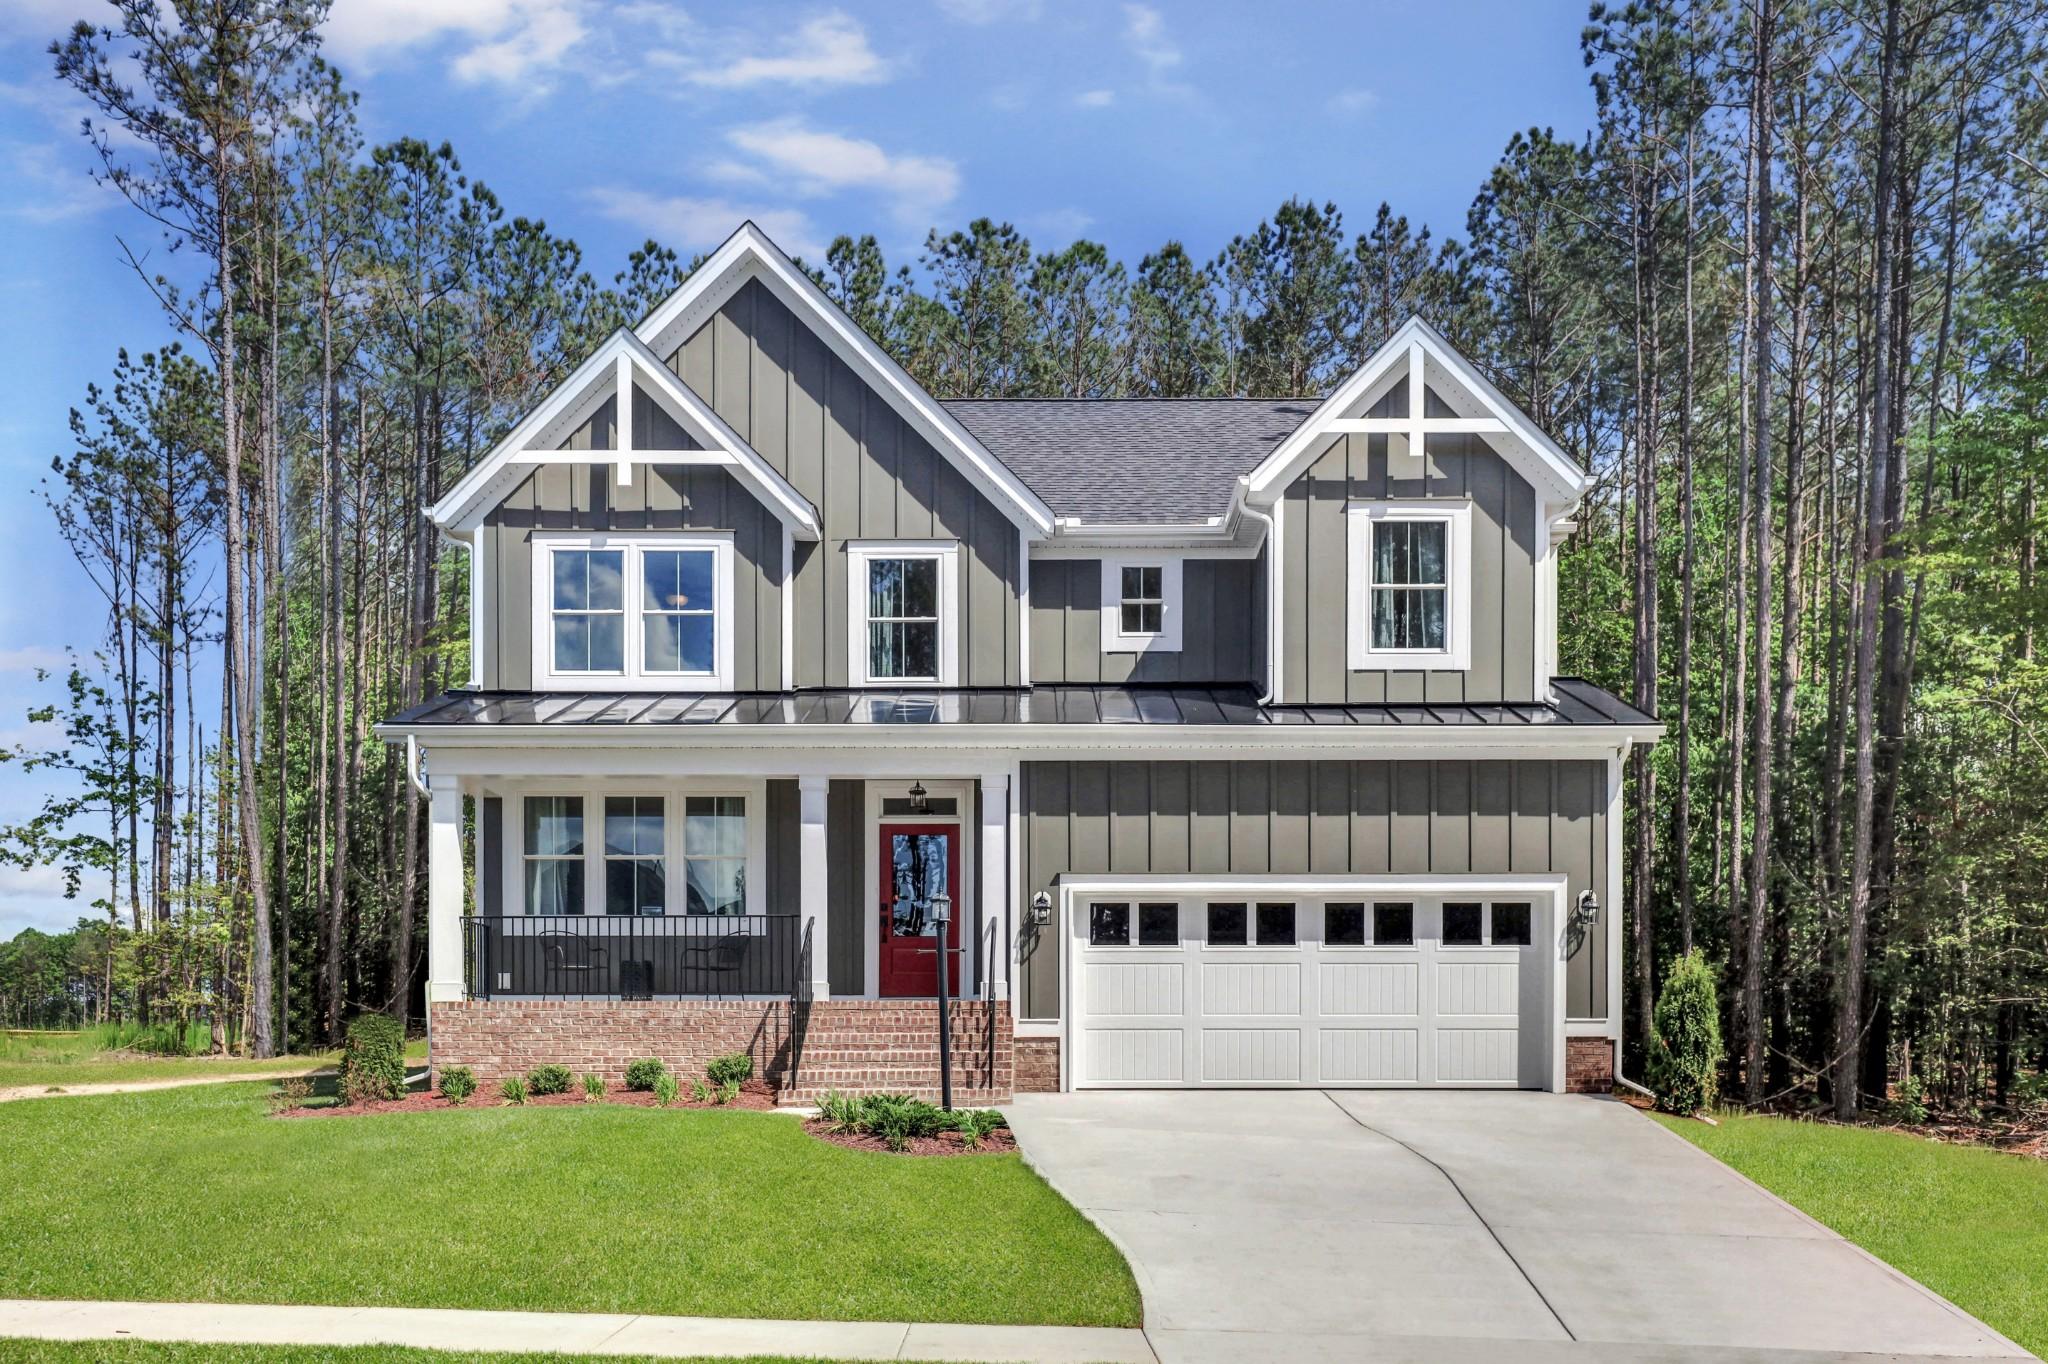 Explore Rutland Grove's Home Plans